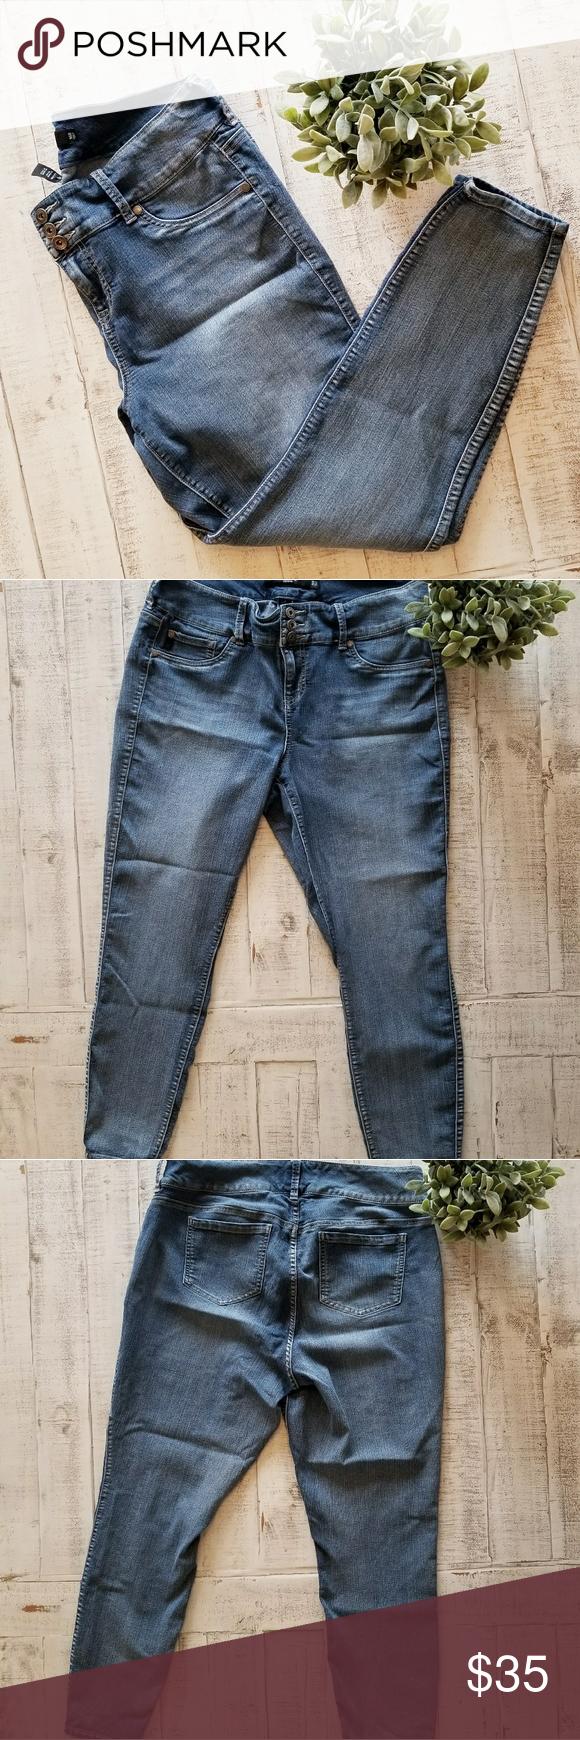 3b97cb5e707 Torrid Plus Size Skinny Jegging Jeans